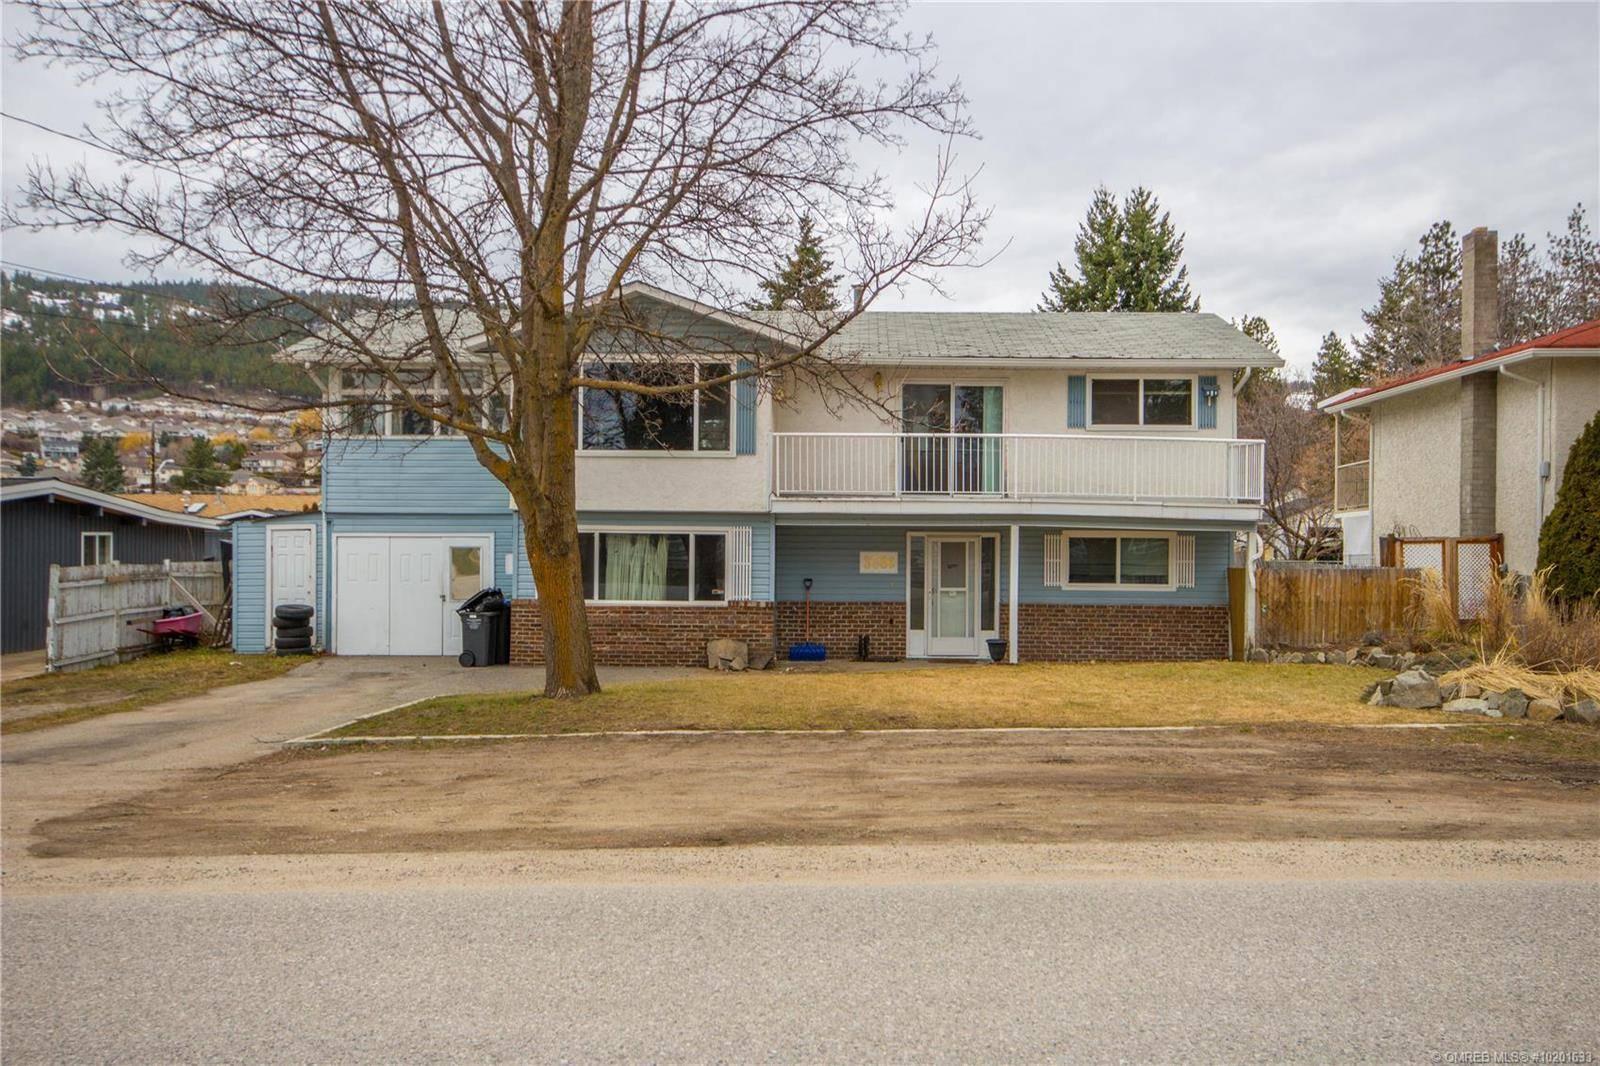 House for sale at 3586 Dunbarton Rd West Kelowna British Columbia - MLS: 10201633